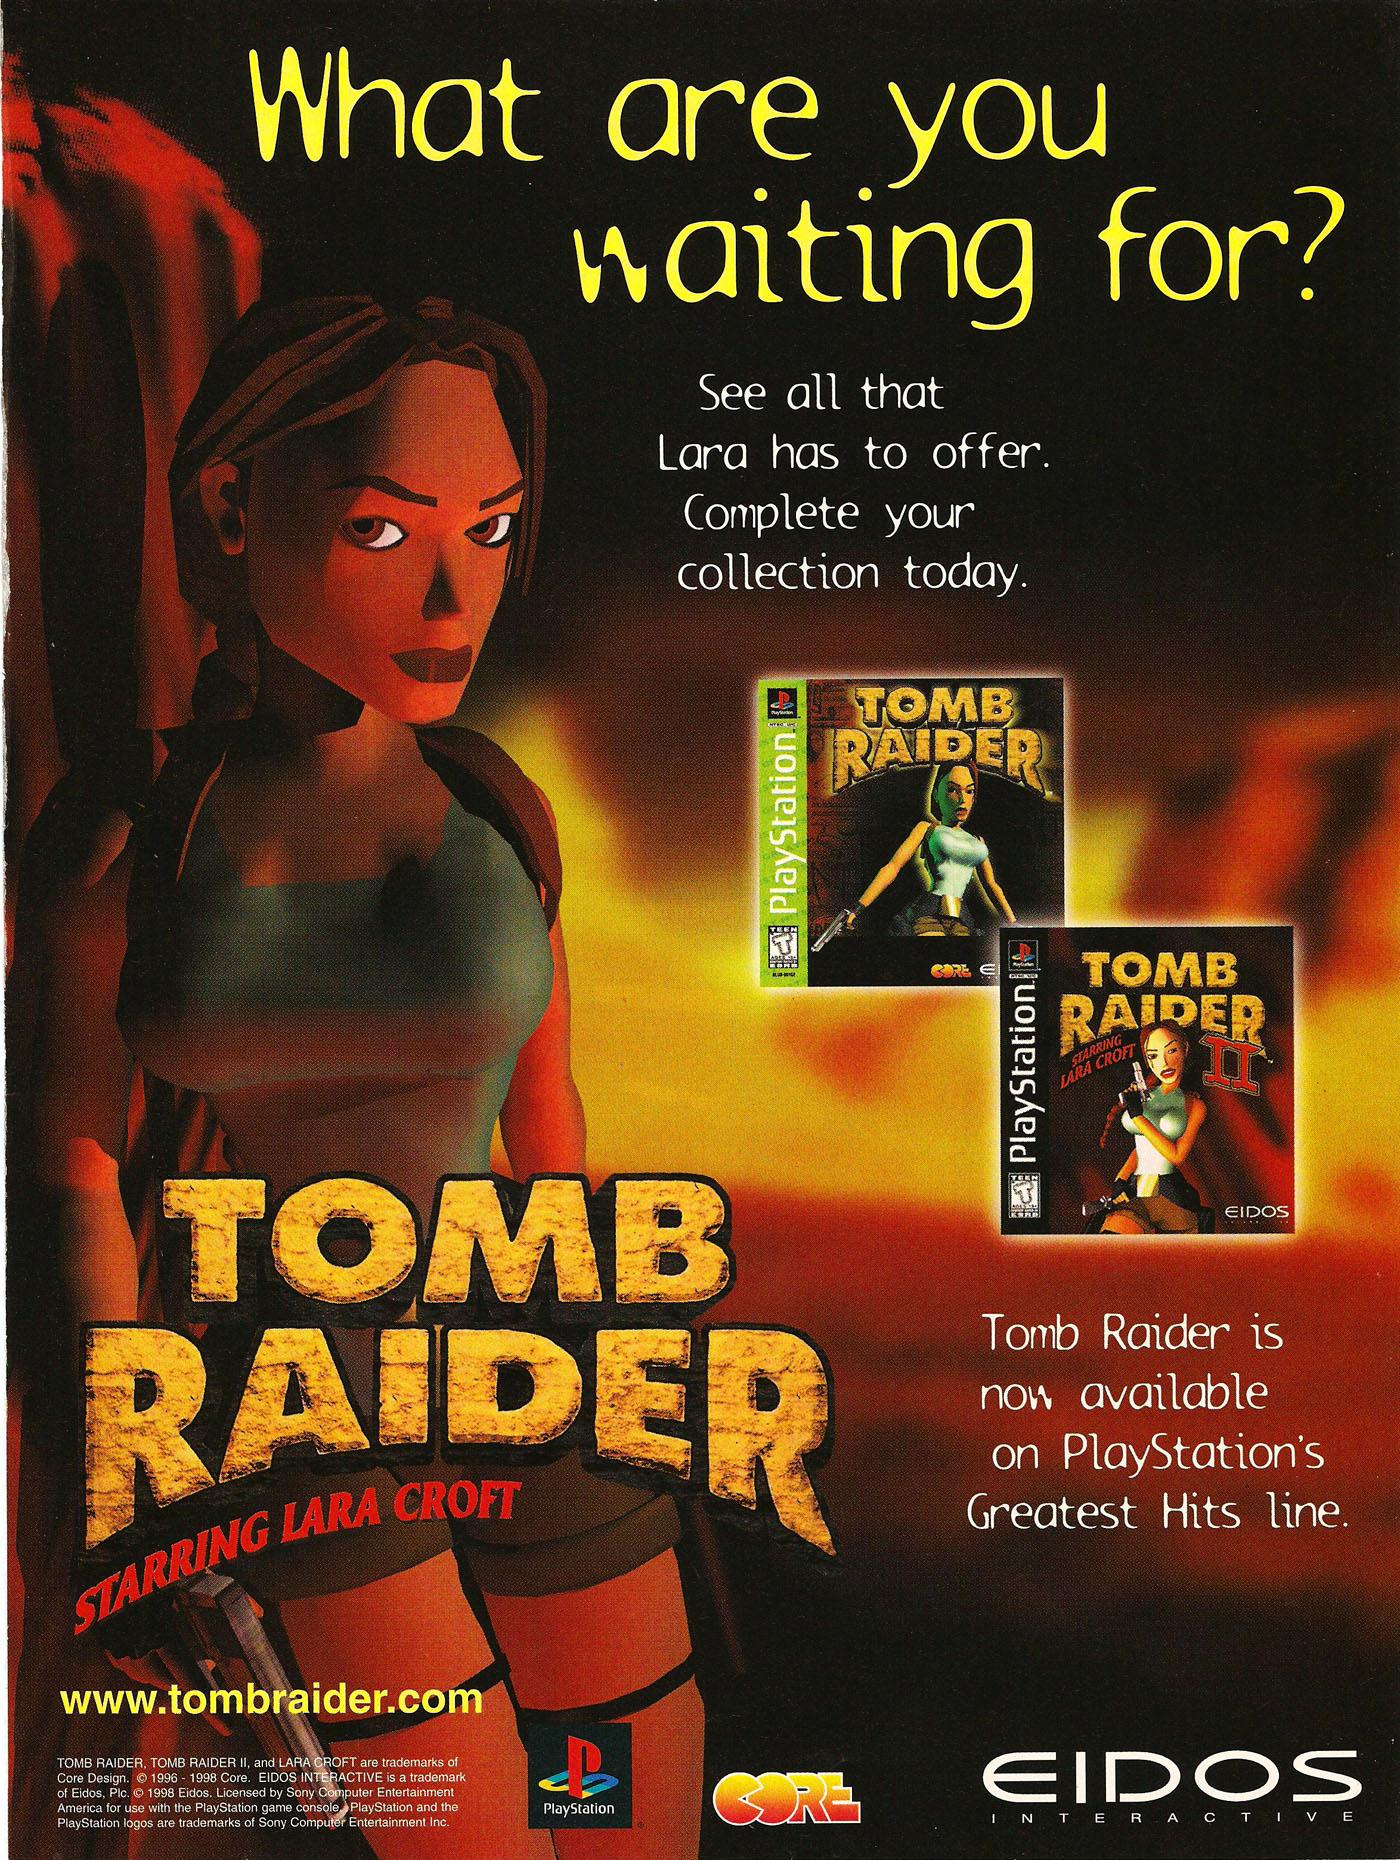 Tomb Raider II APK+DATA - AndroPalace